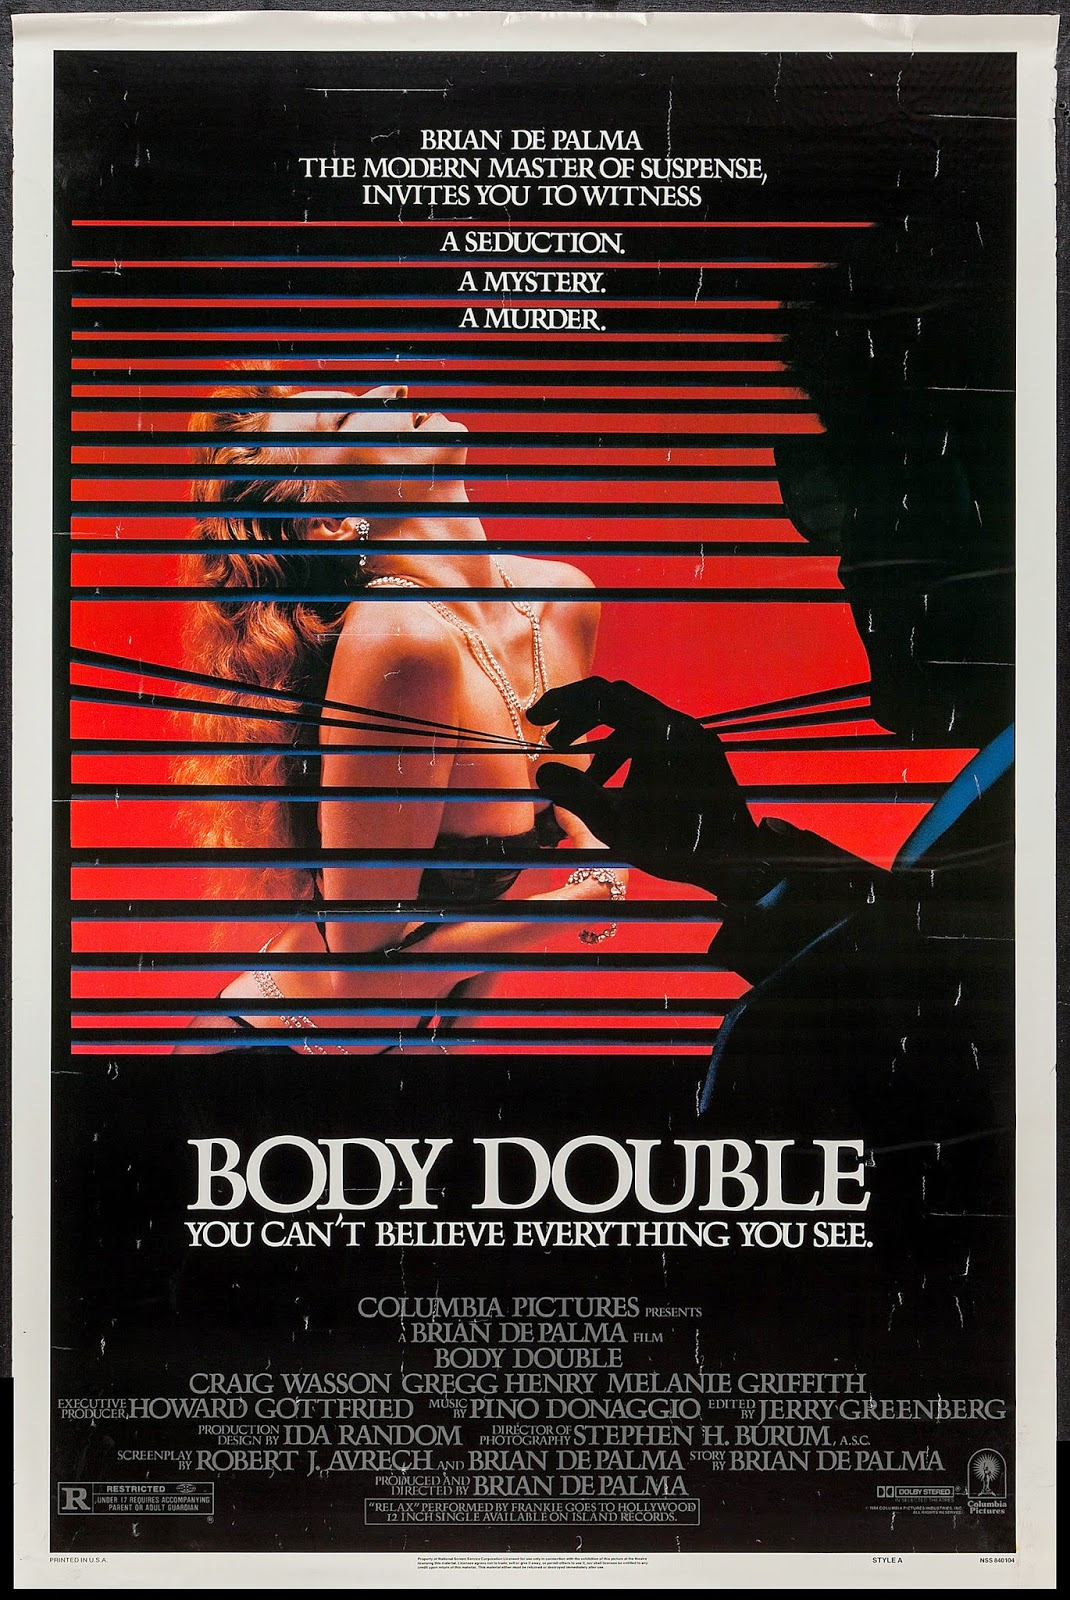 BODY DOUBLE - American Poster 1.jpeg